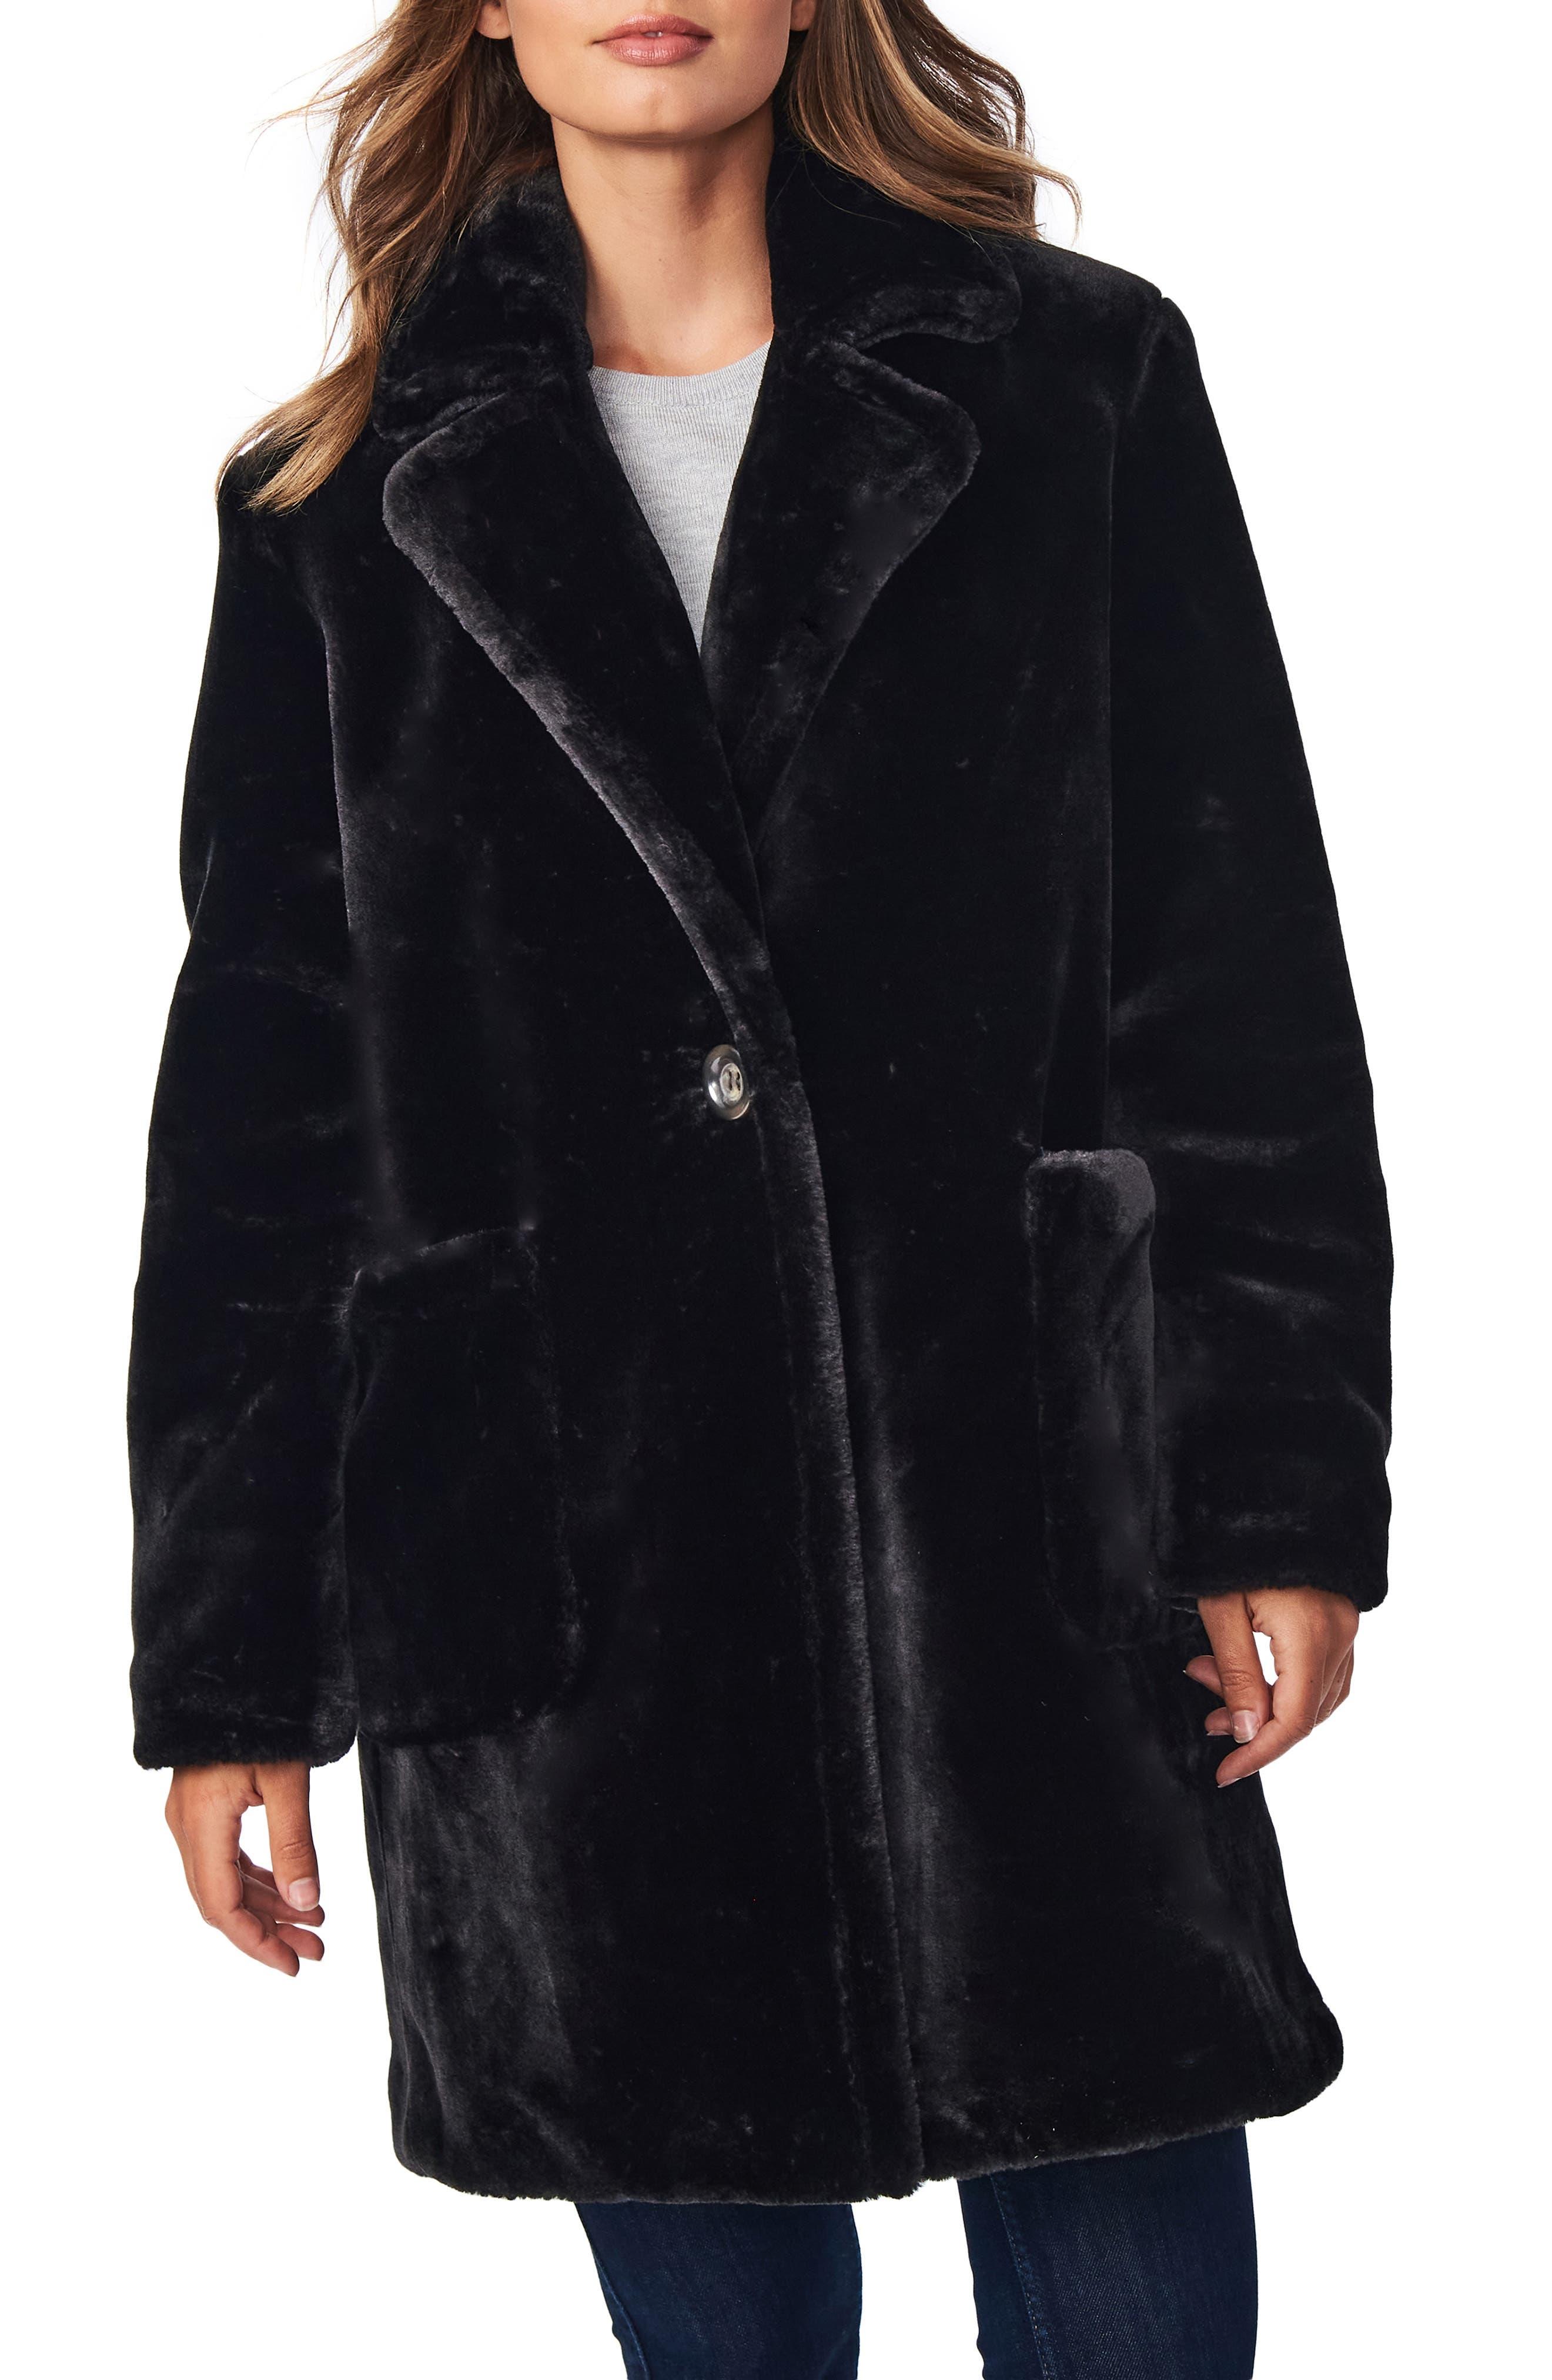 1920s Coats, Furs, Jackets and Capes History Womens Bernardo Smooth Faux Fur Long Coat $99.90 AT vintagedancer.com